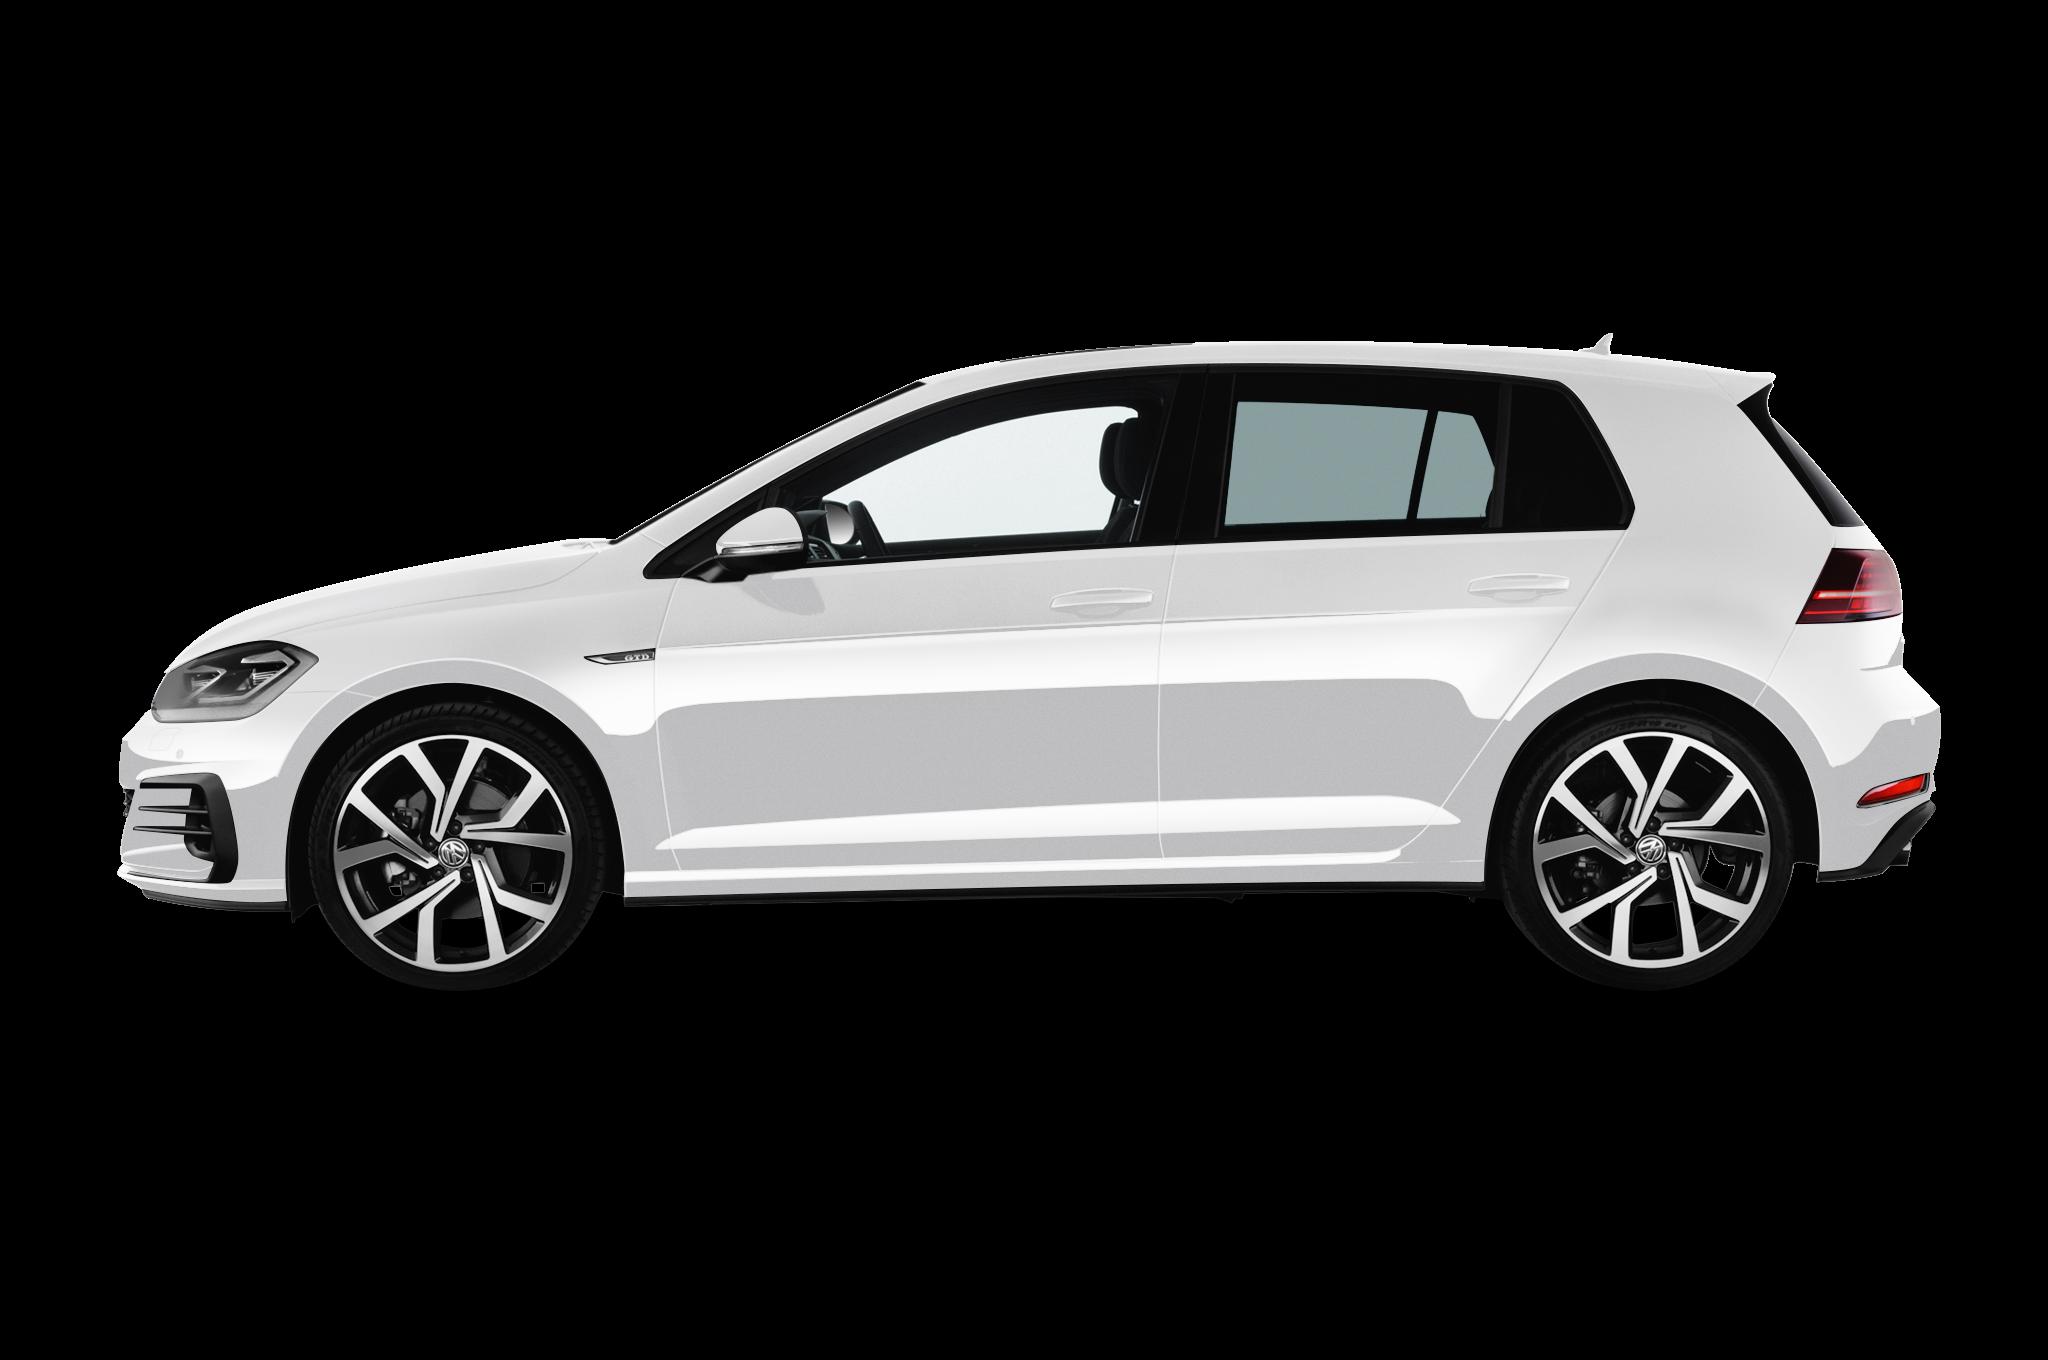 Volkswagen Golf 8 Kaufen Angebote Mit 12 891 Rabatt Carwow De